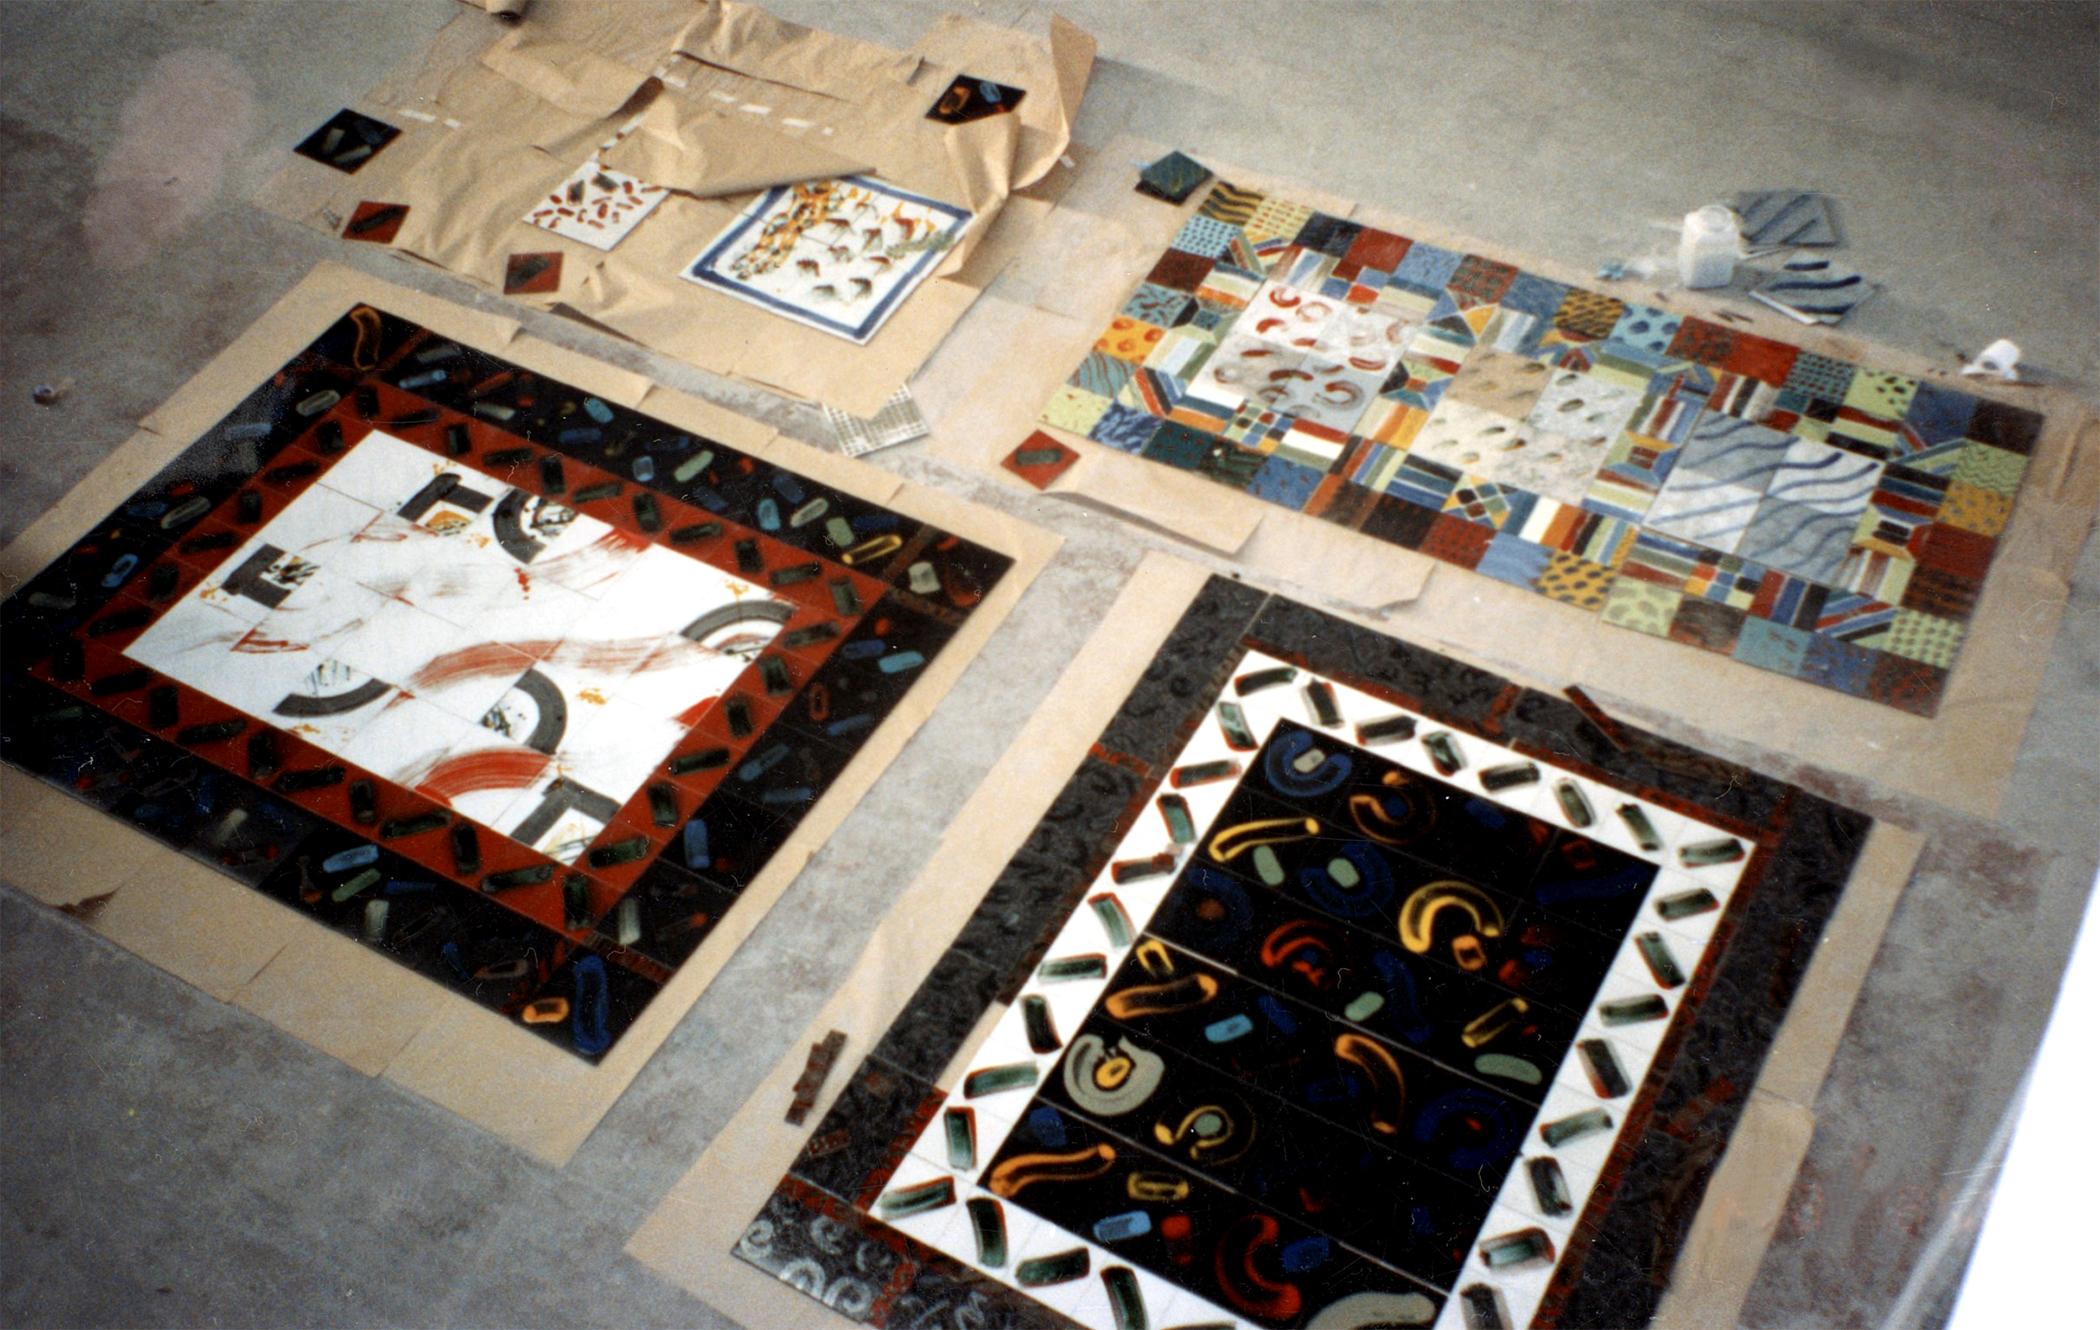 NEGEV CERAMICS Tile factory work in progress Yeruham, Israel